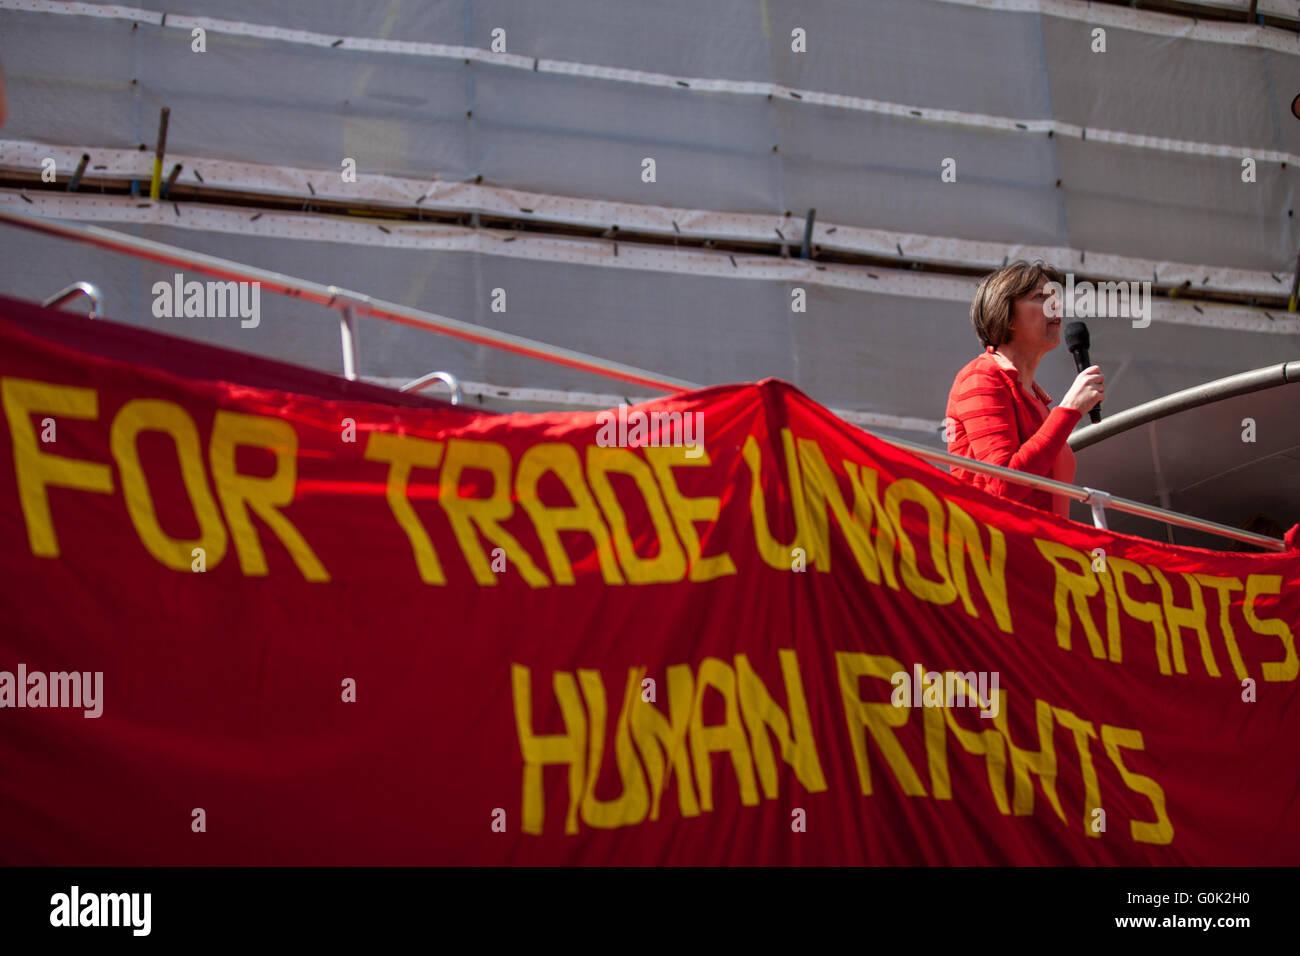 London, UK. 1st May, 2016. Frances O'Grady, General Secretary of the British Trades Union Congress (TUC), addresses - Stock Image